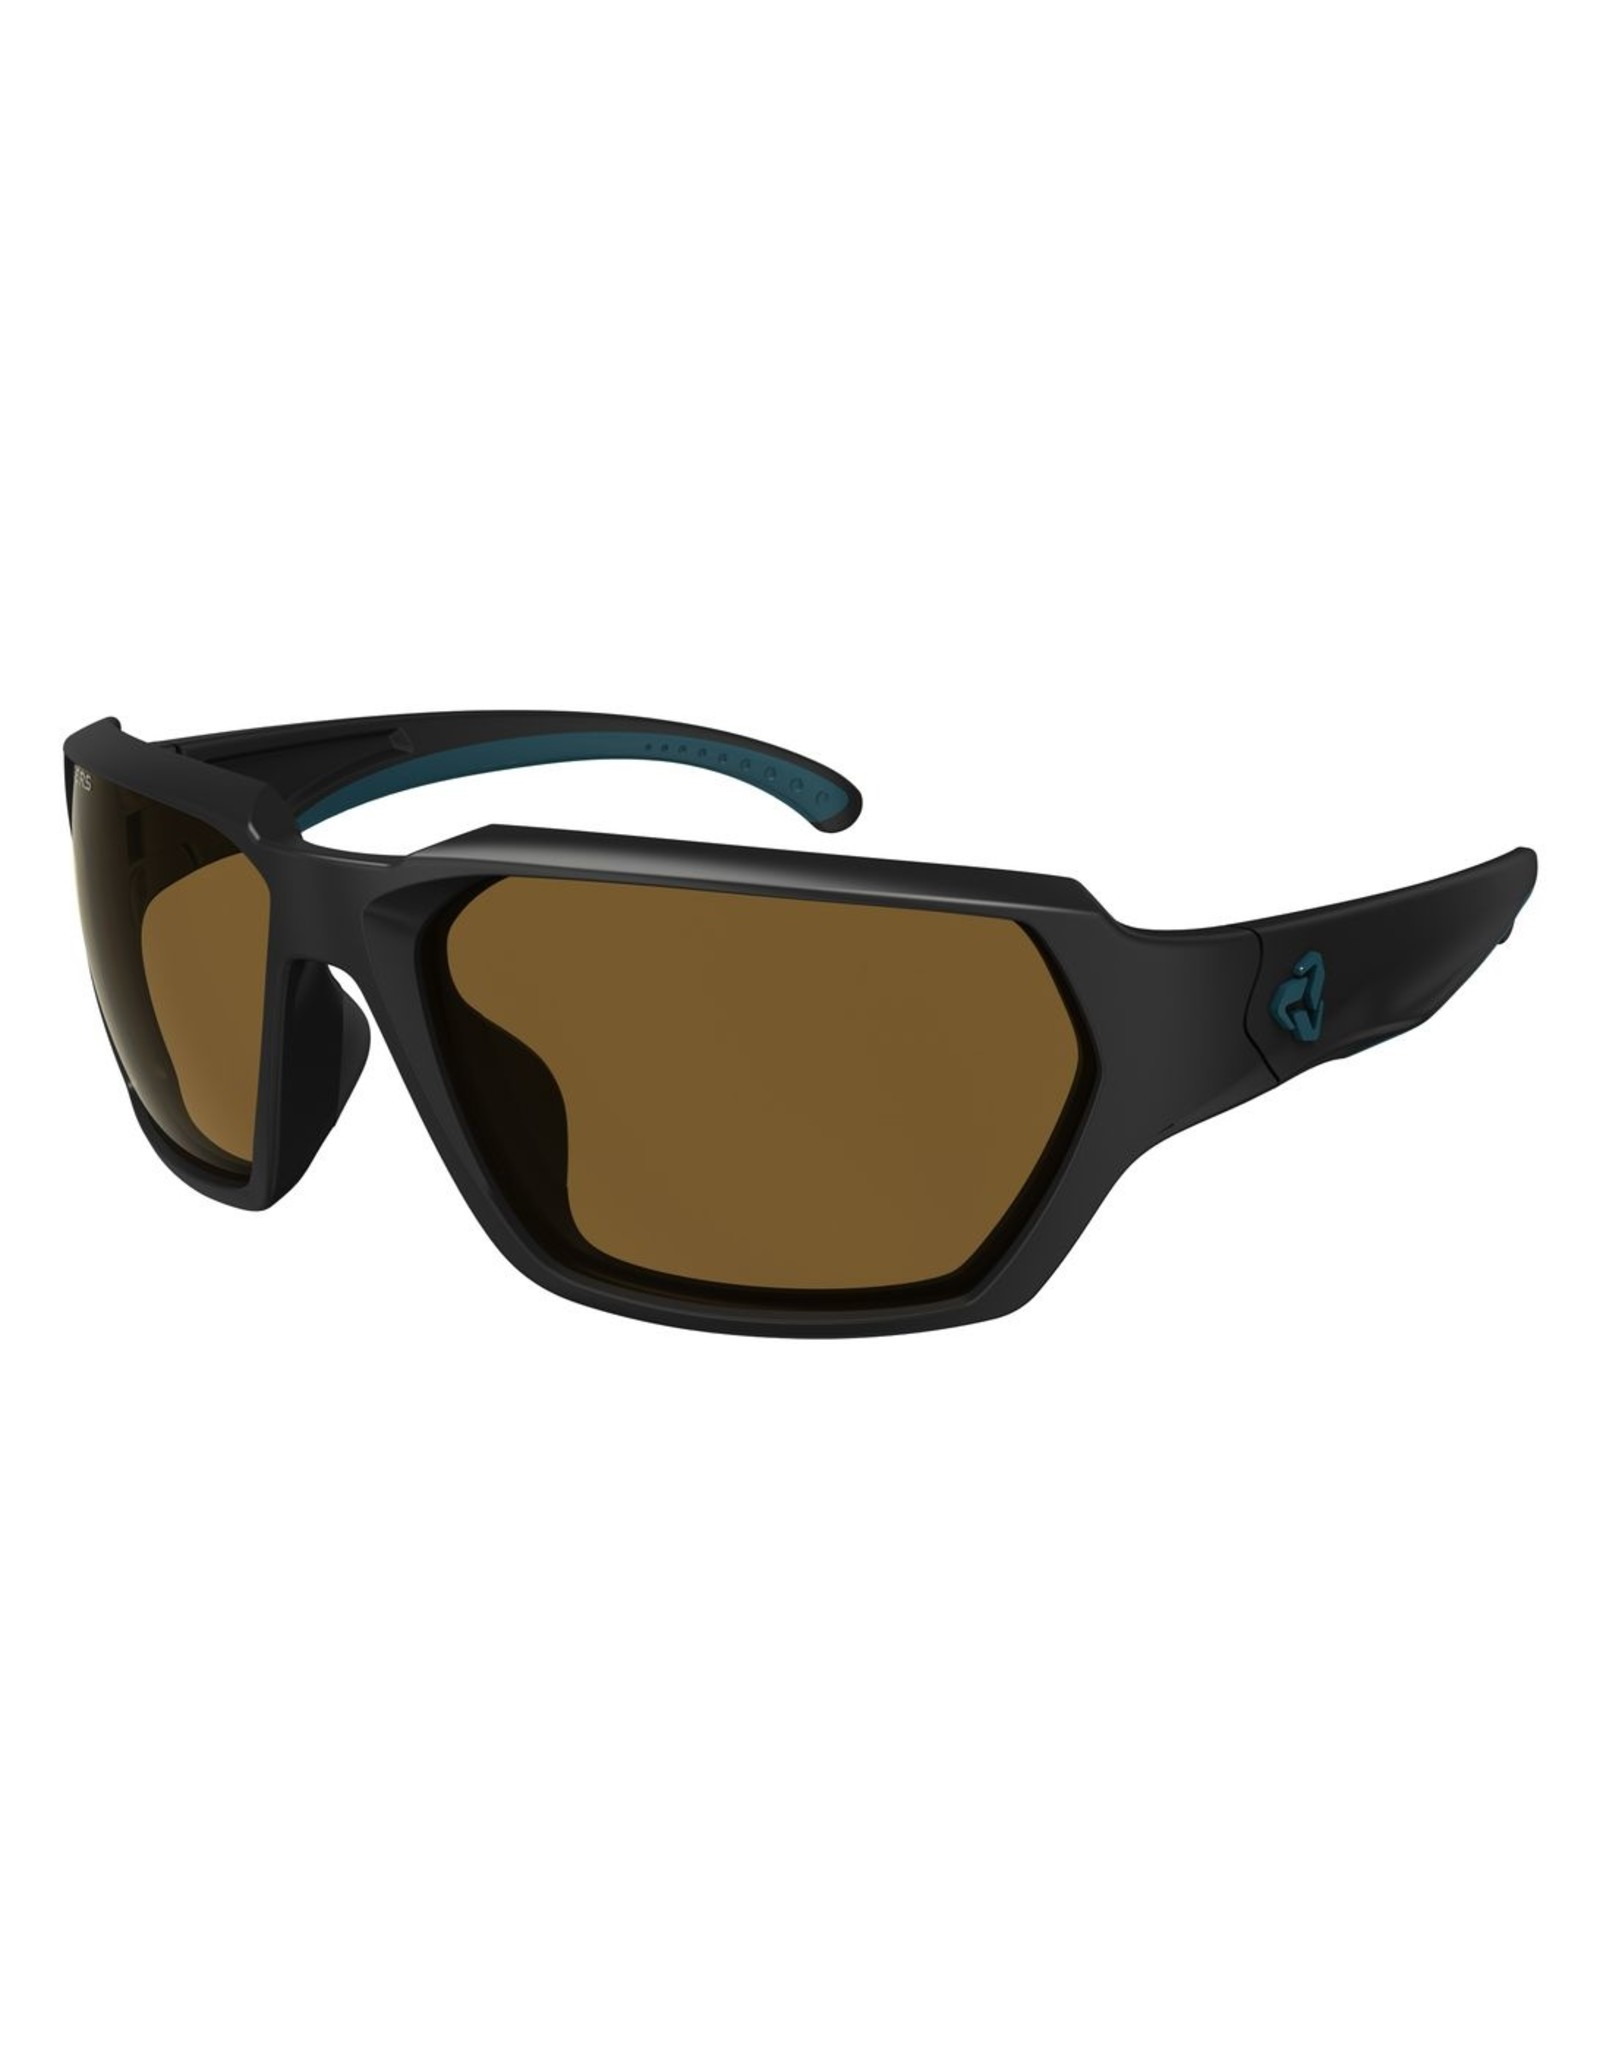 Ryders Eyewear - Face Poly Black Matte - Blue/Brown Lens